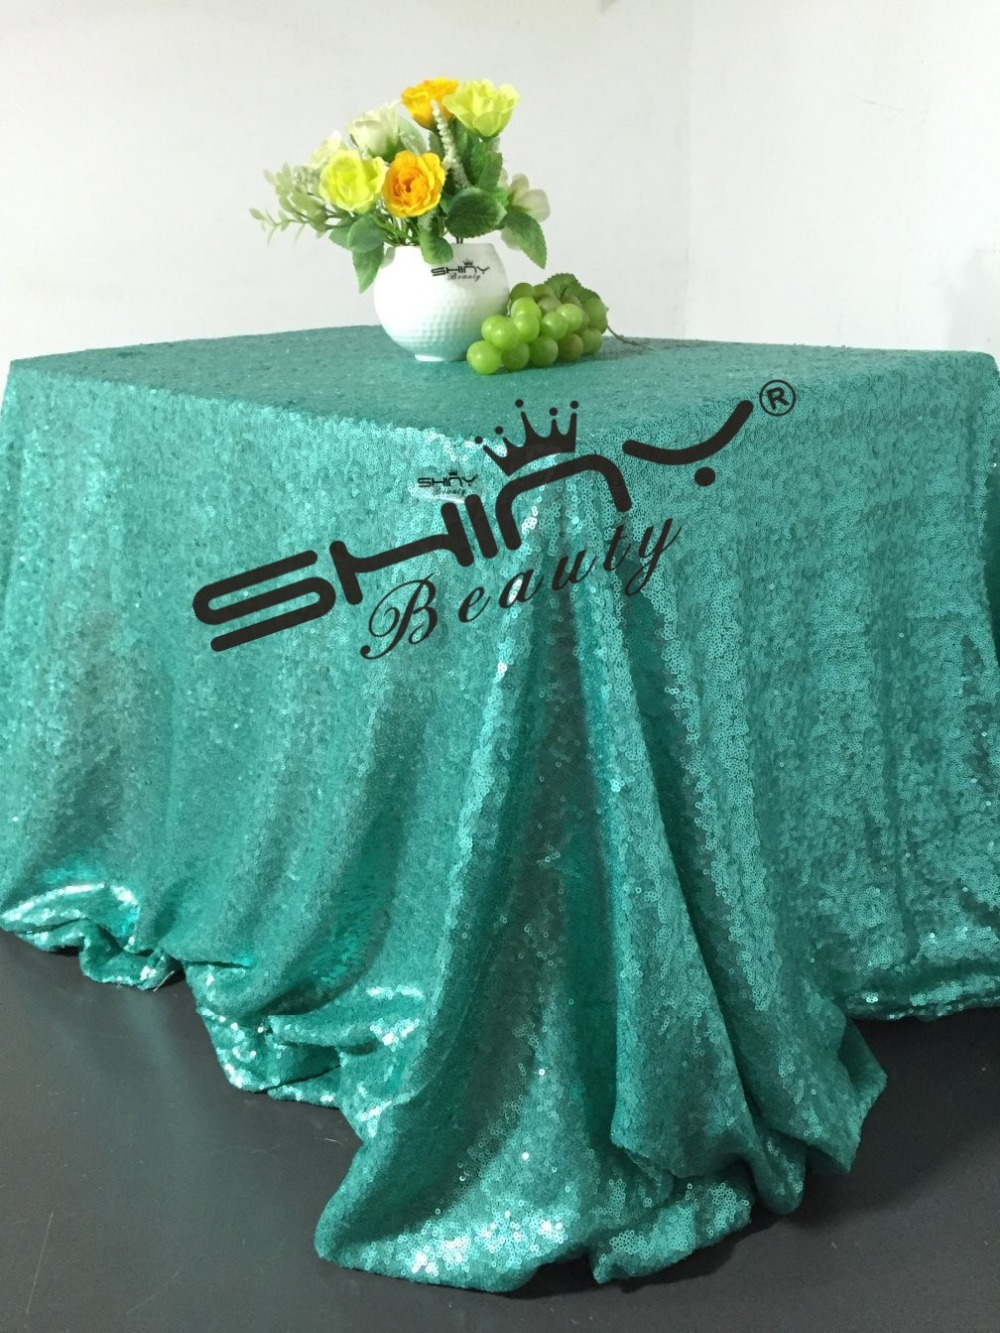 ShinyBeauty Popular Matte Green Sequin tablecloth On sale! Sequin Shimmer Tablecloth 60x102 RECTANGULAR-a